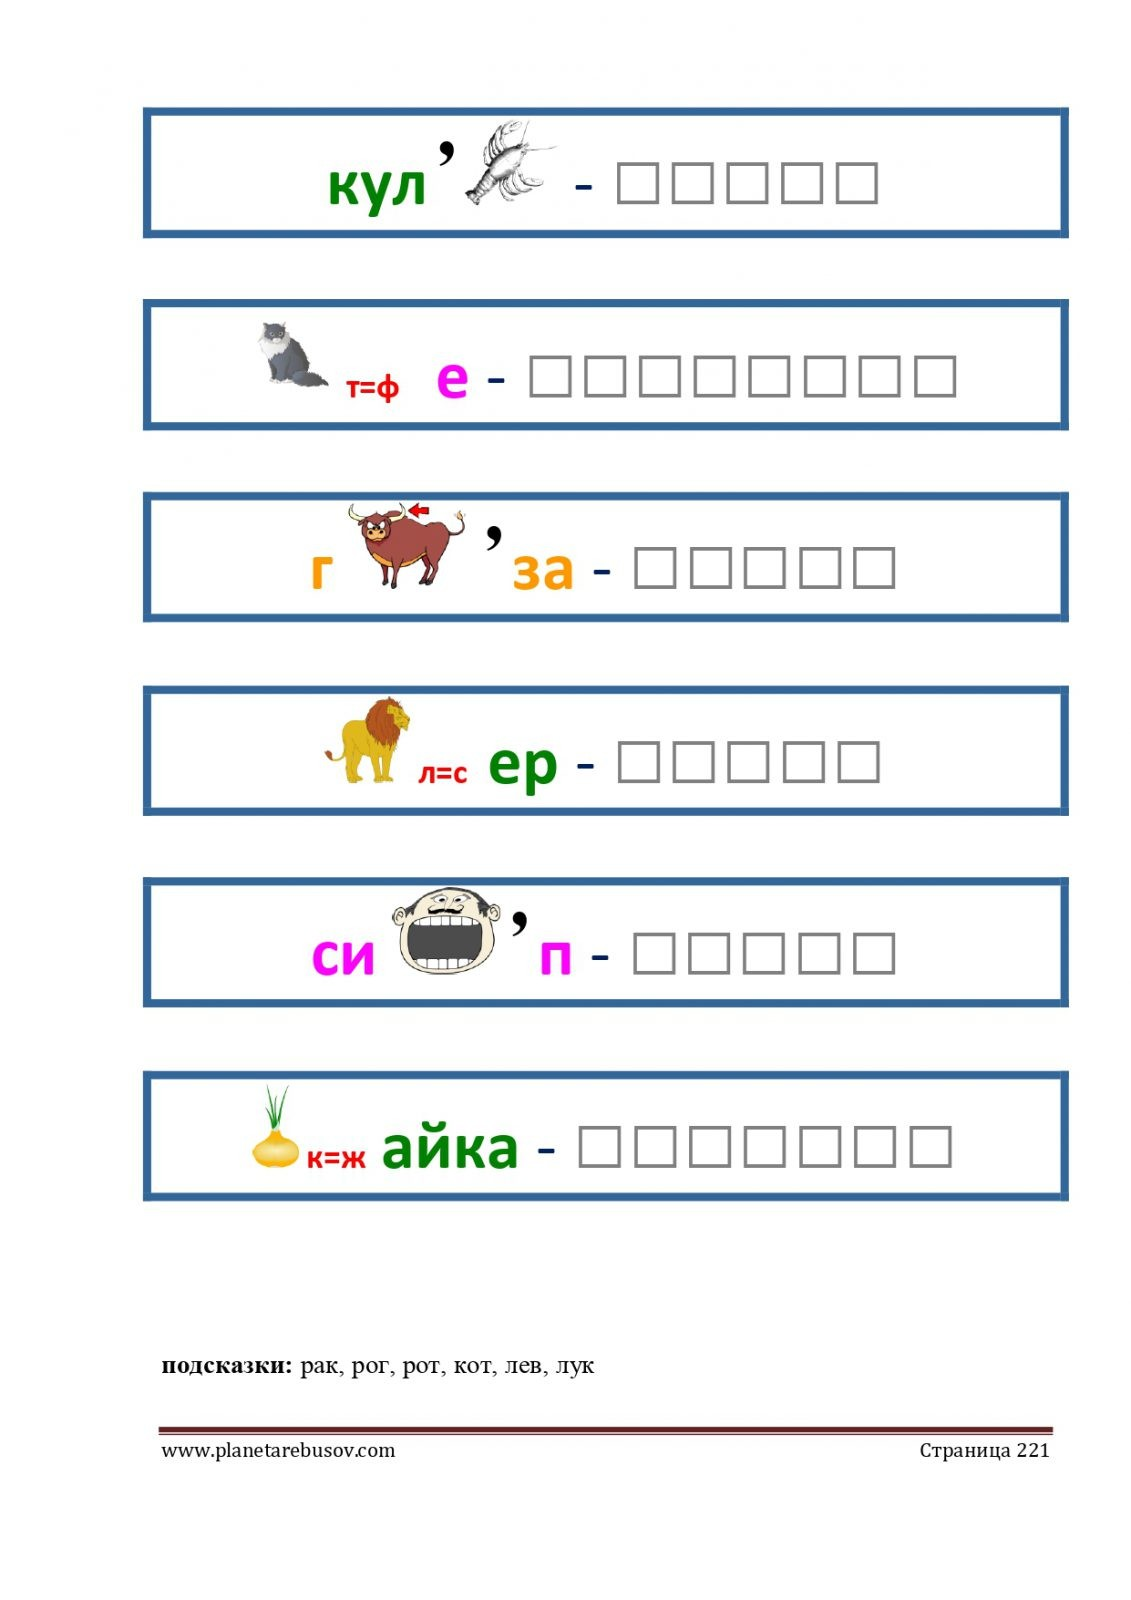 Ребусы: кулак, гроза, сироп, кофе, север, лужайка